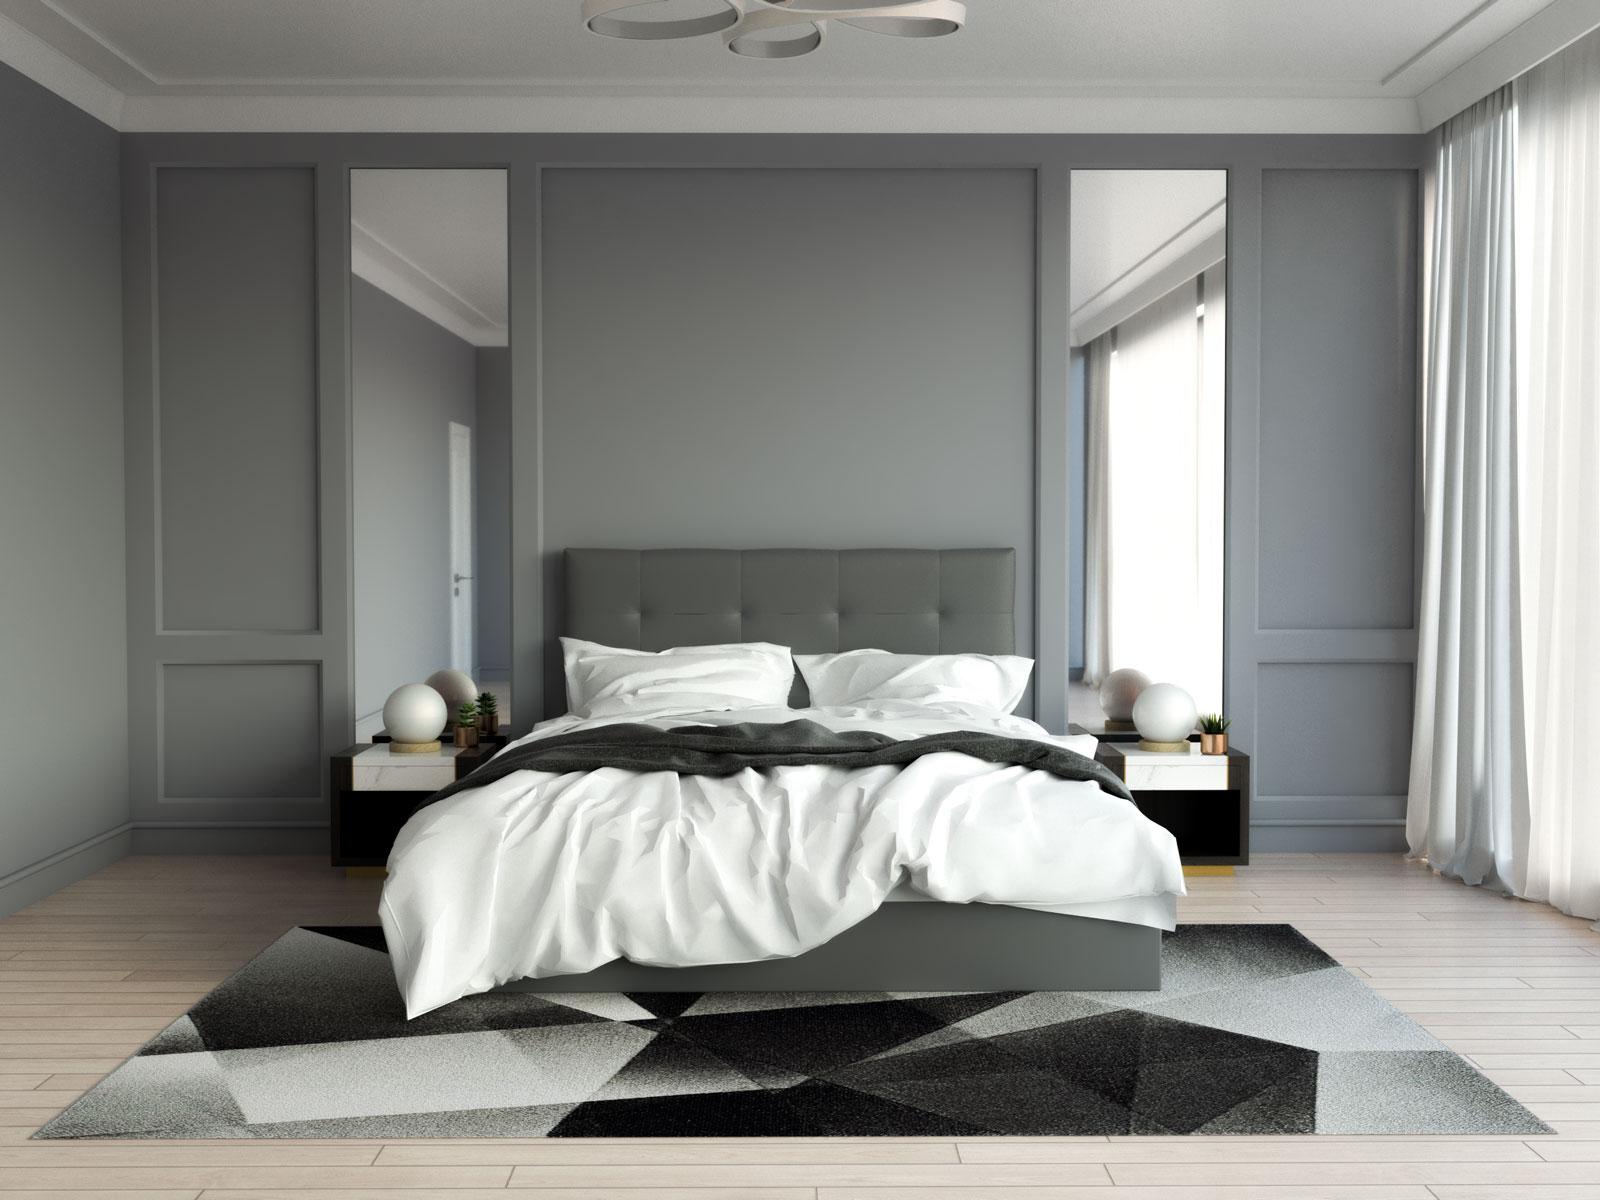 Black and gray rug inside gray bedroom